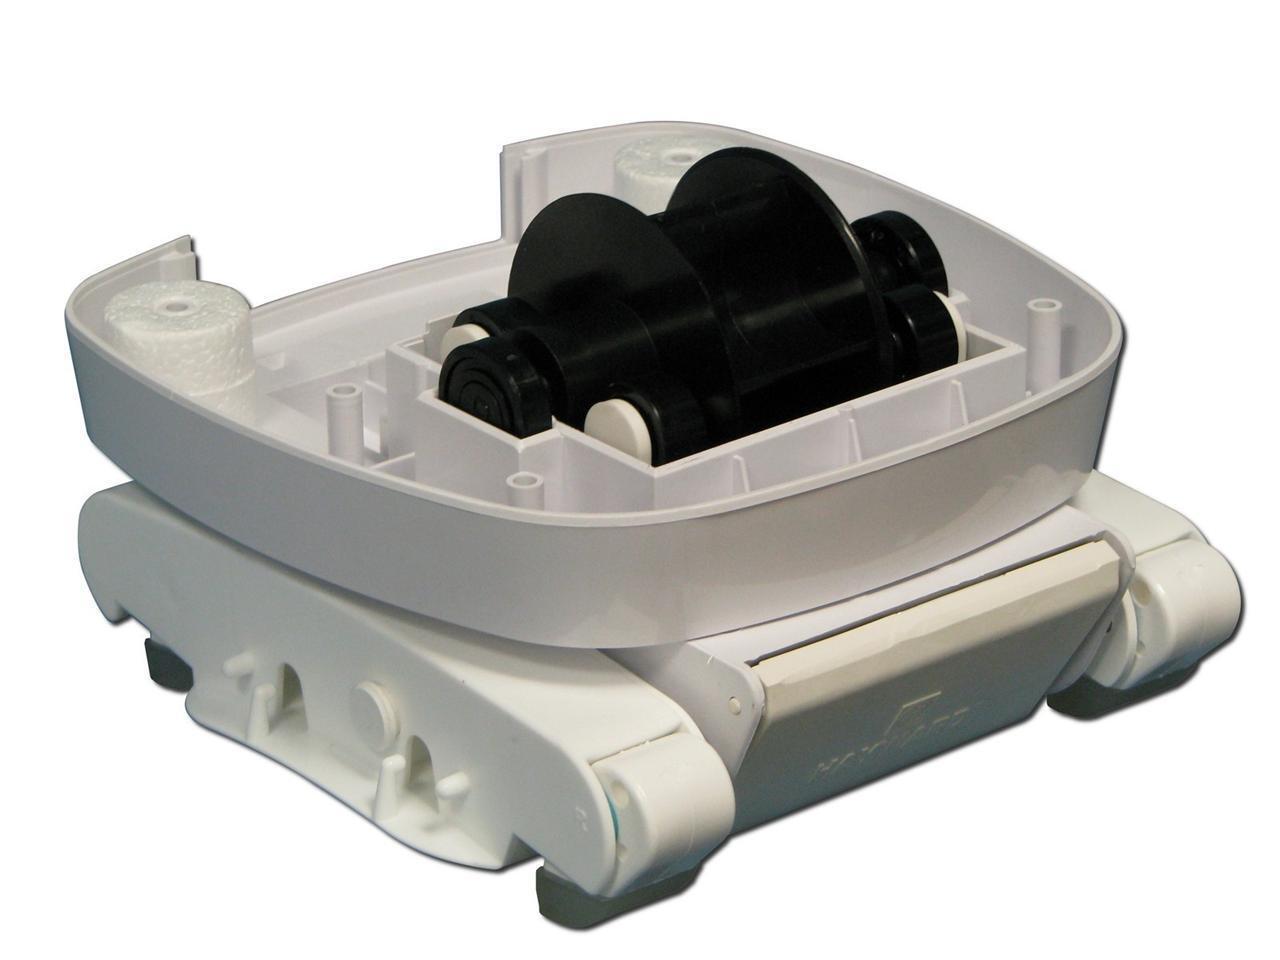 Envío gratuito de 3-4 días HAYWARD NAVIGATOR Pool Vac Ultra propulsión Kit AXV622DPK